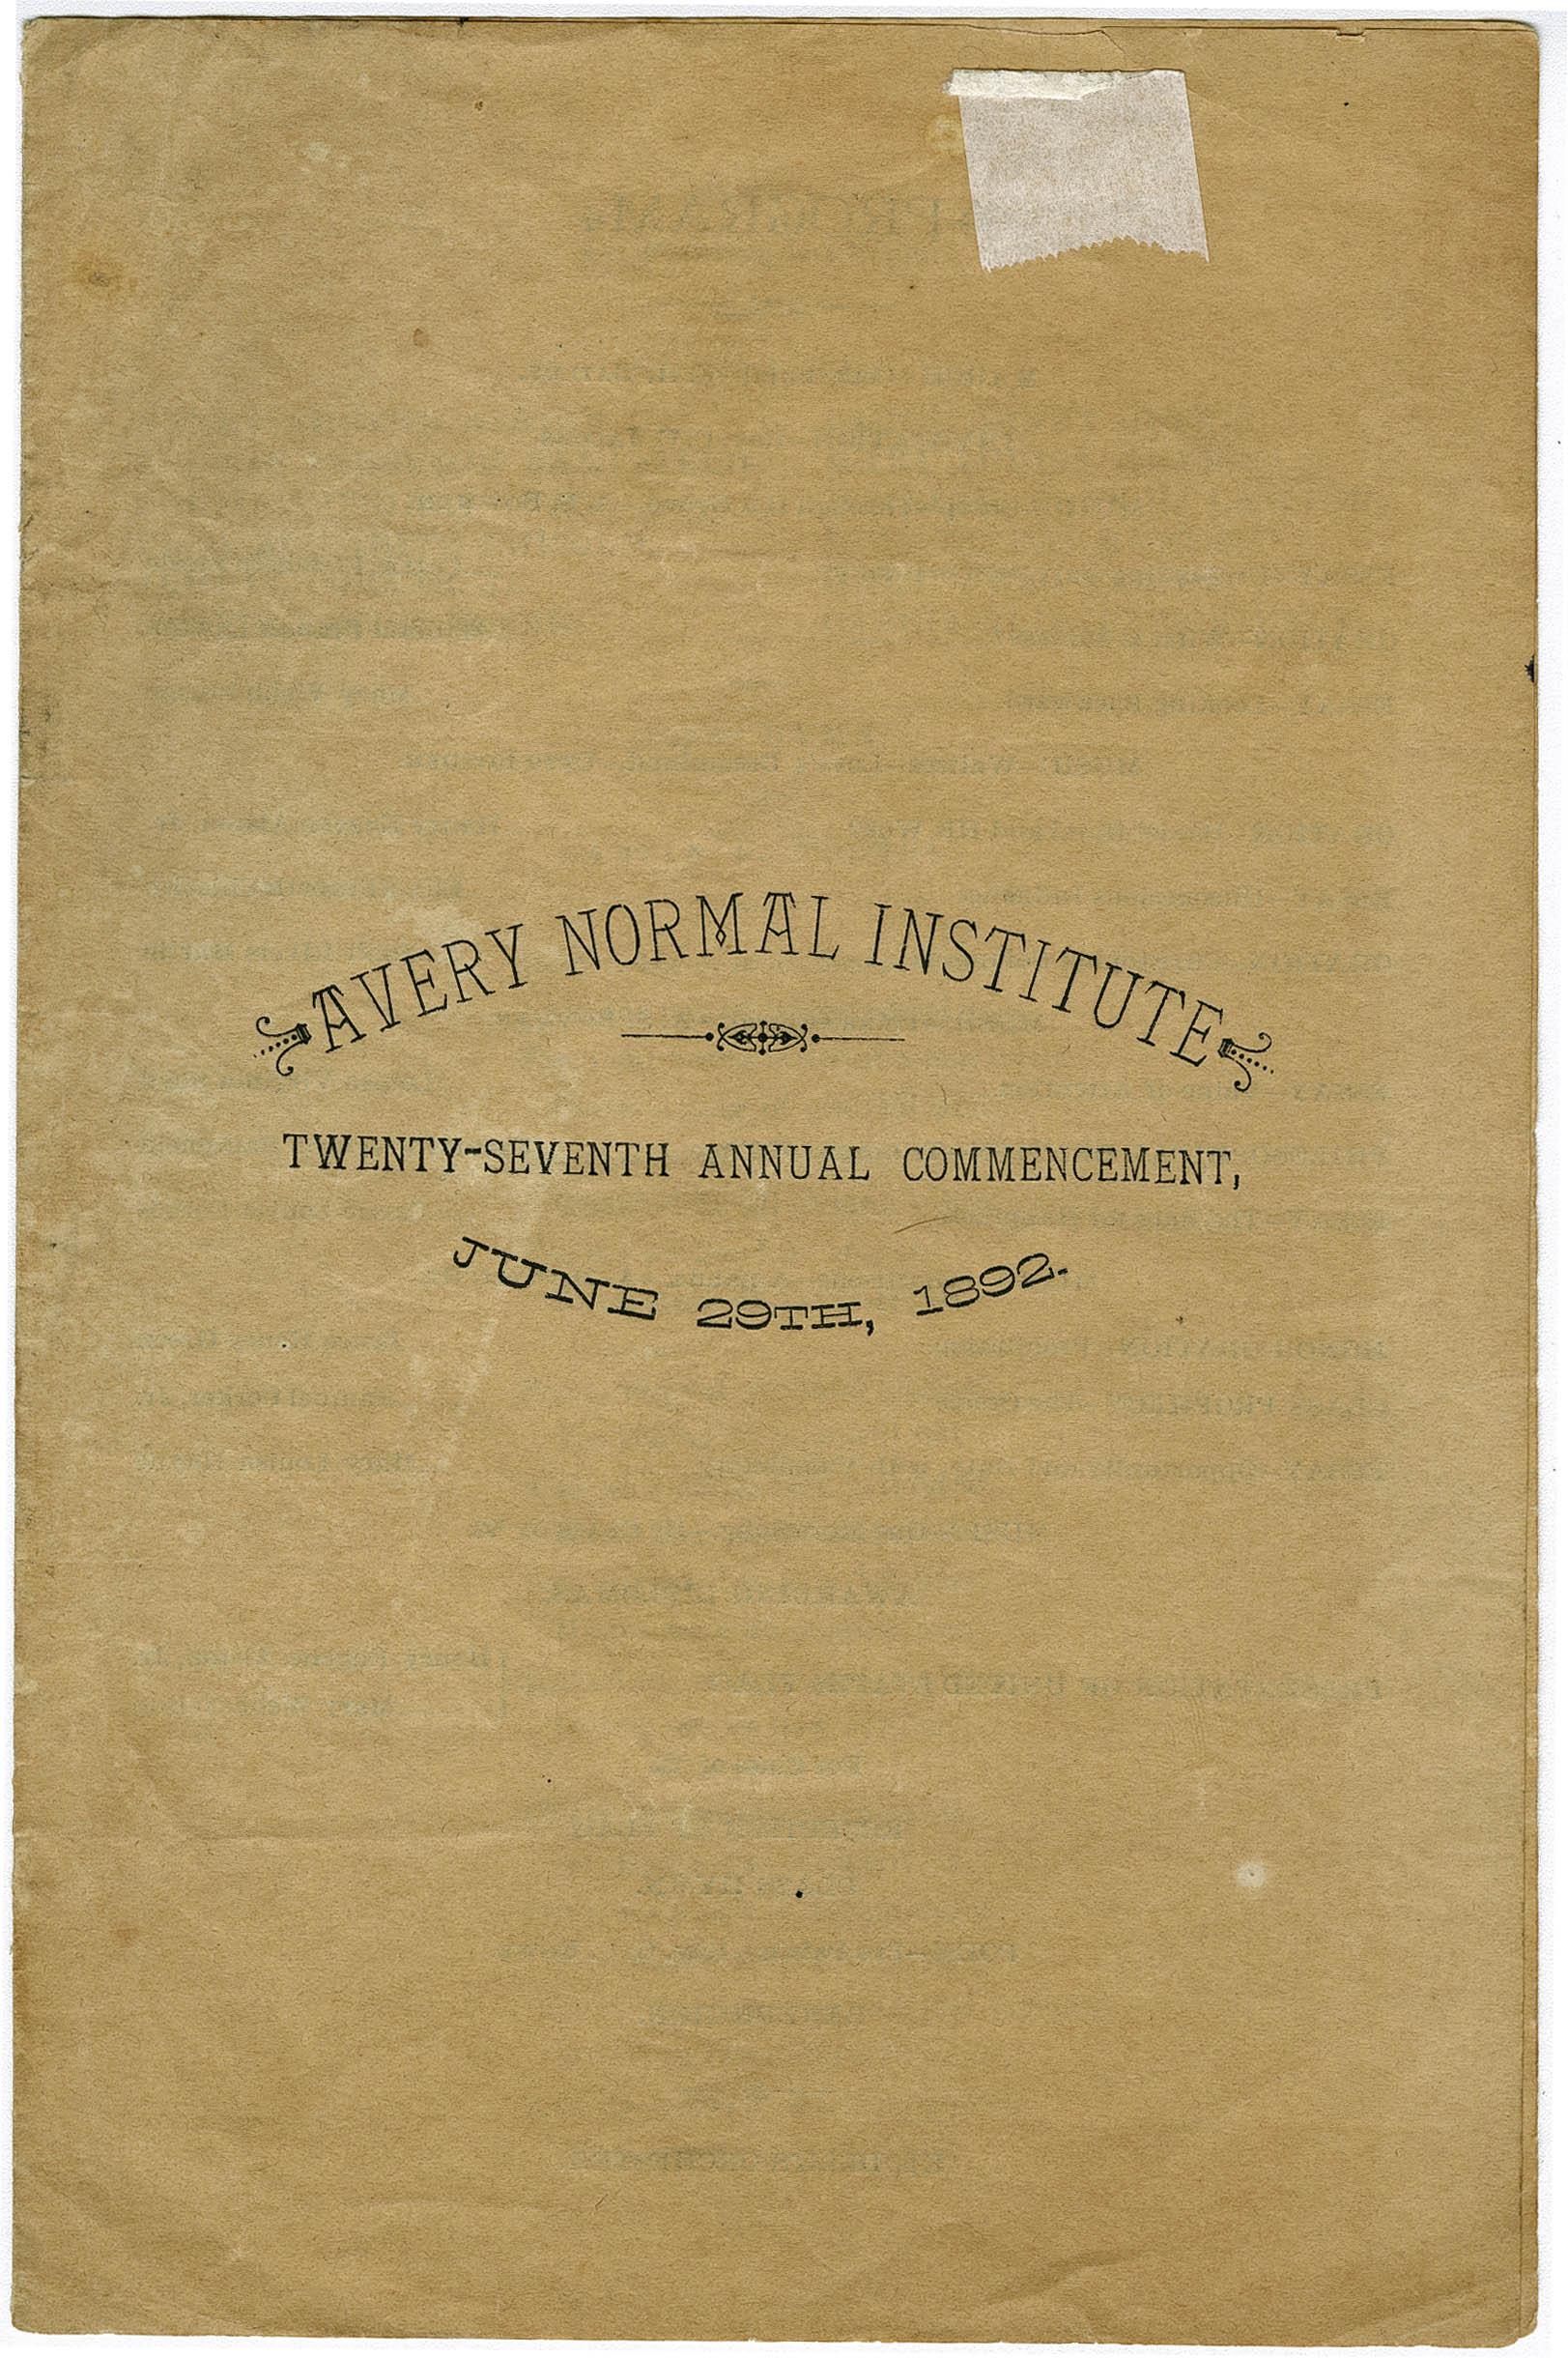 Avery Normal Institutle Twenty-Seventh Annual Commencement Program